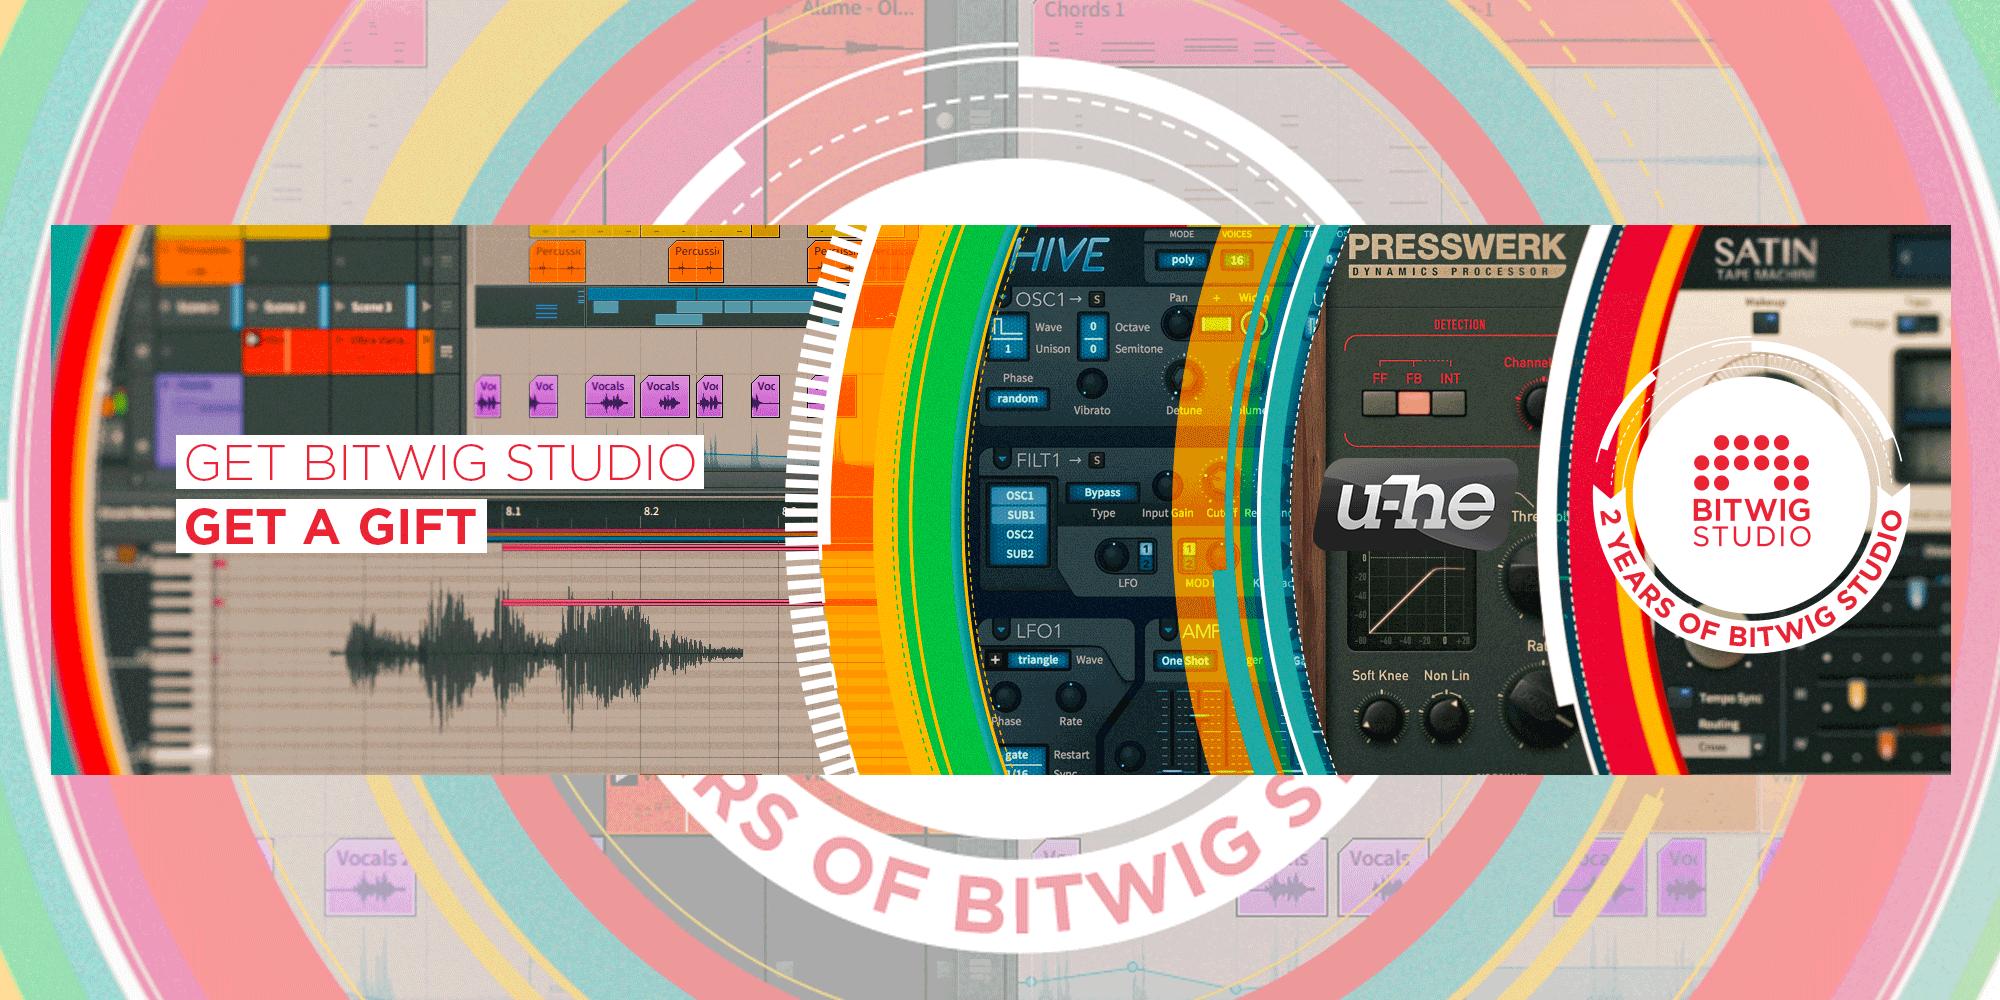 Bitwig Studio買うと、u-heプラグインが!!